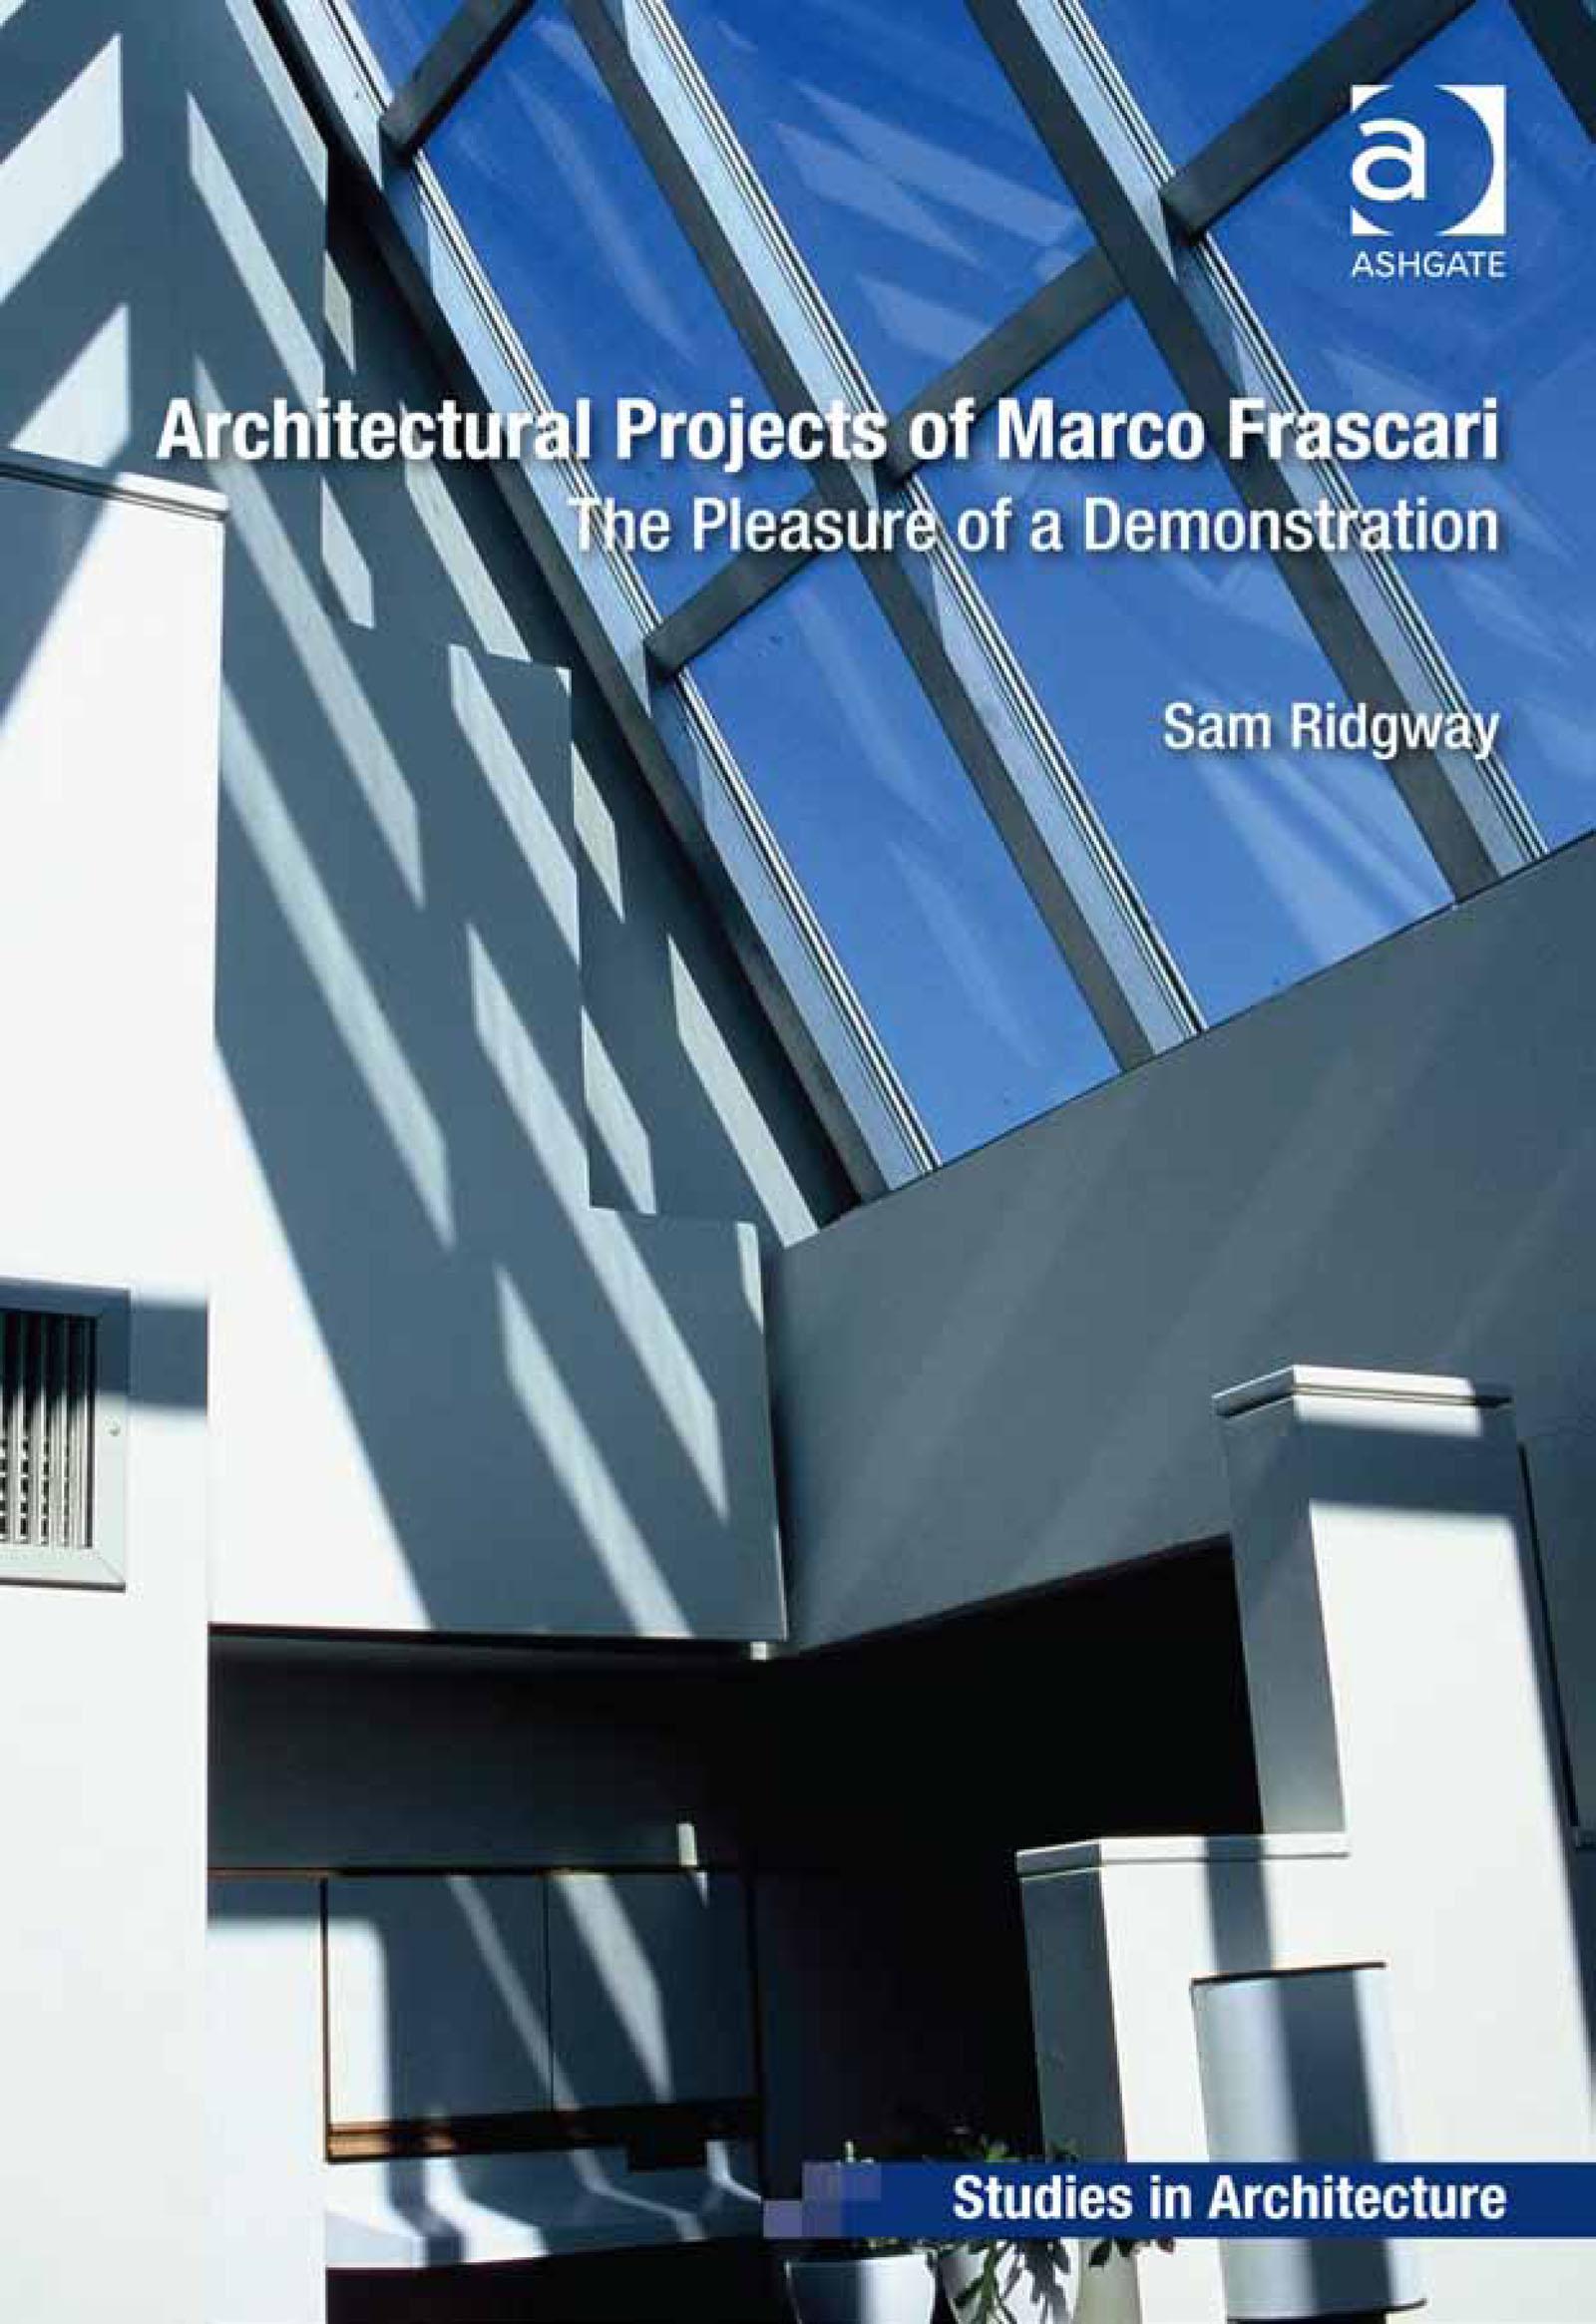 ebay architecture study